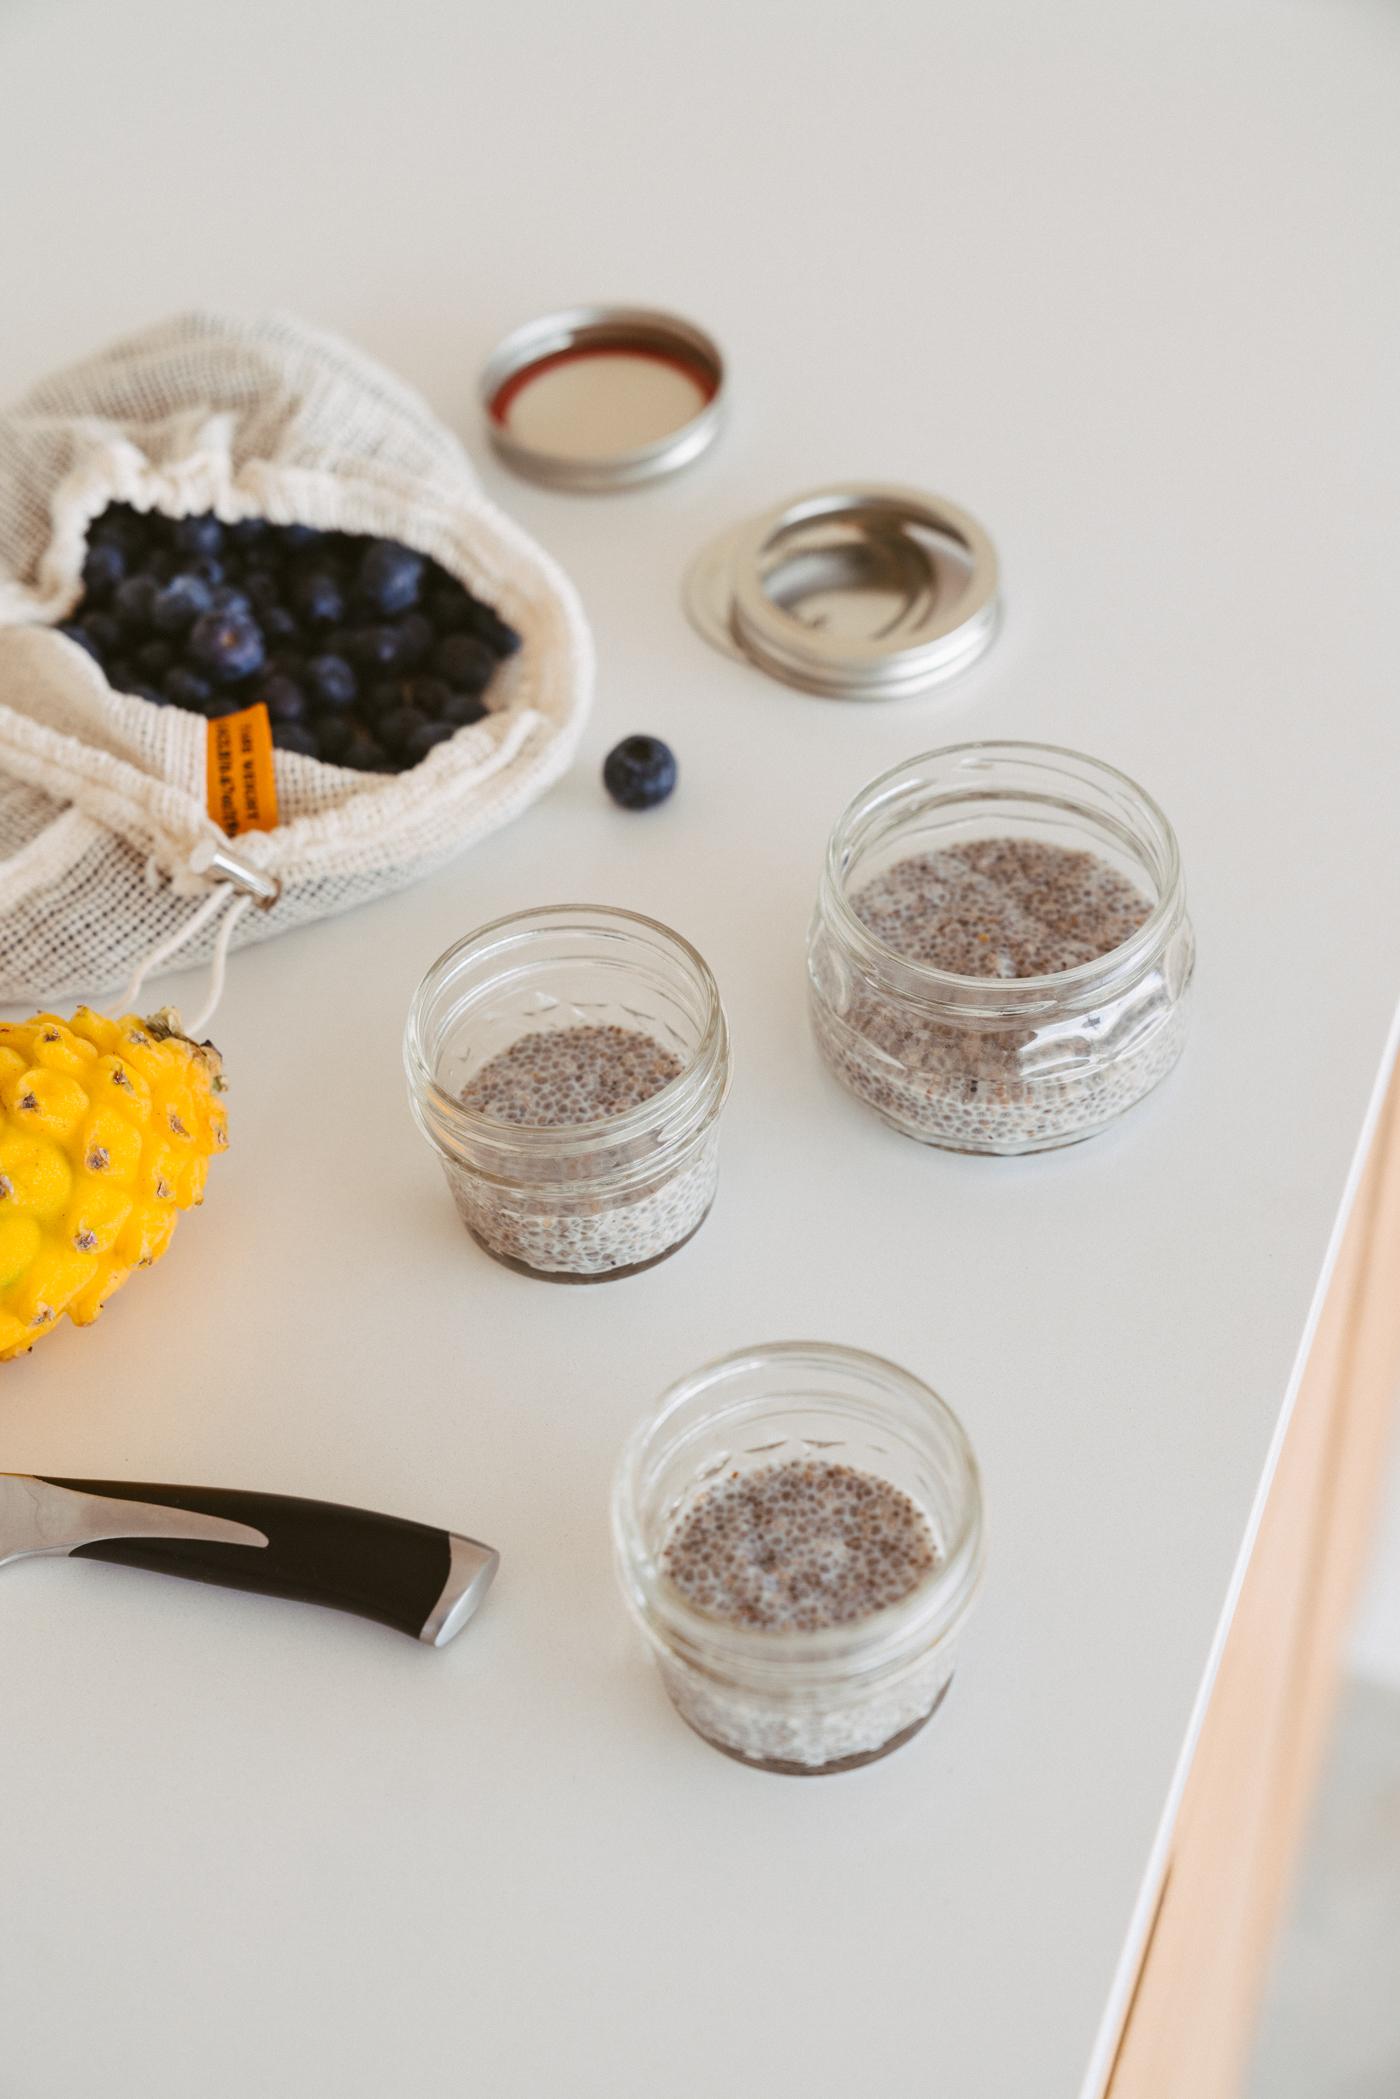 mango_passionfruit_chia_and_yoghurt_jars.jpg